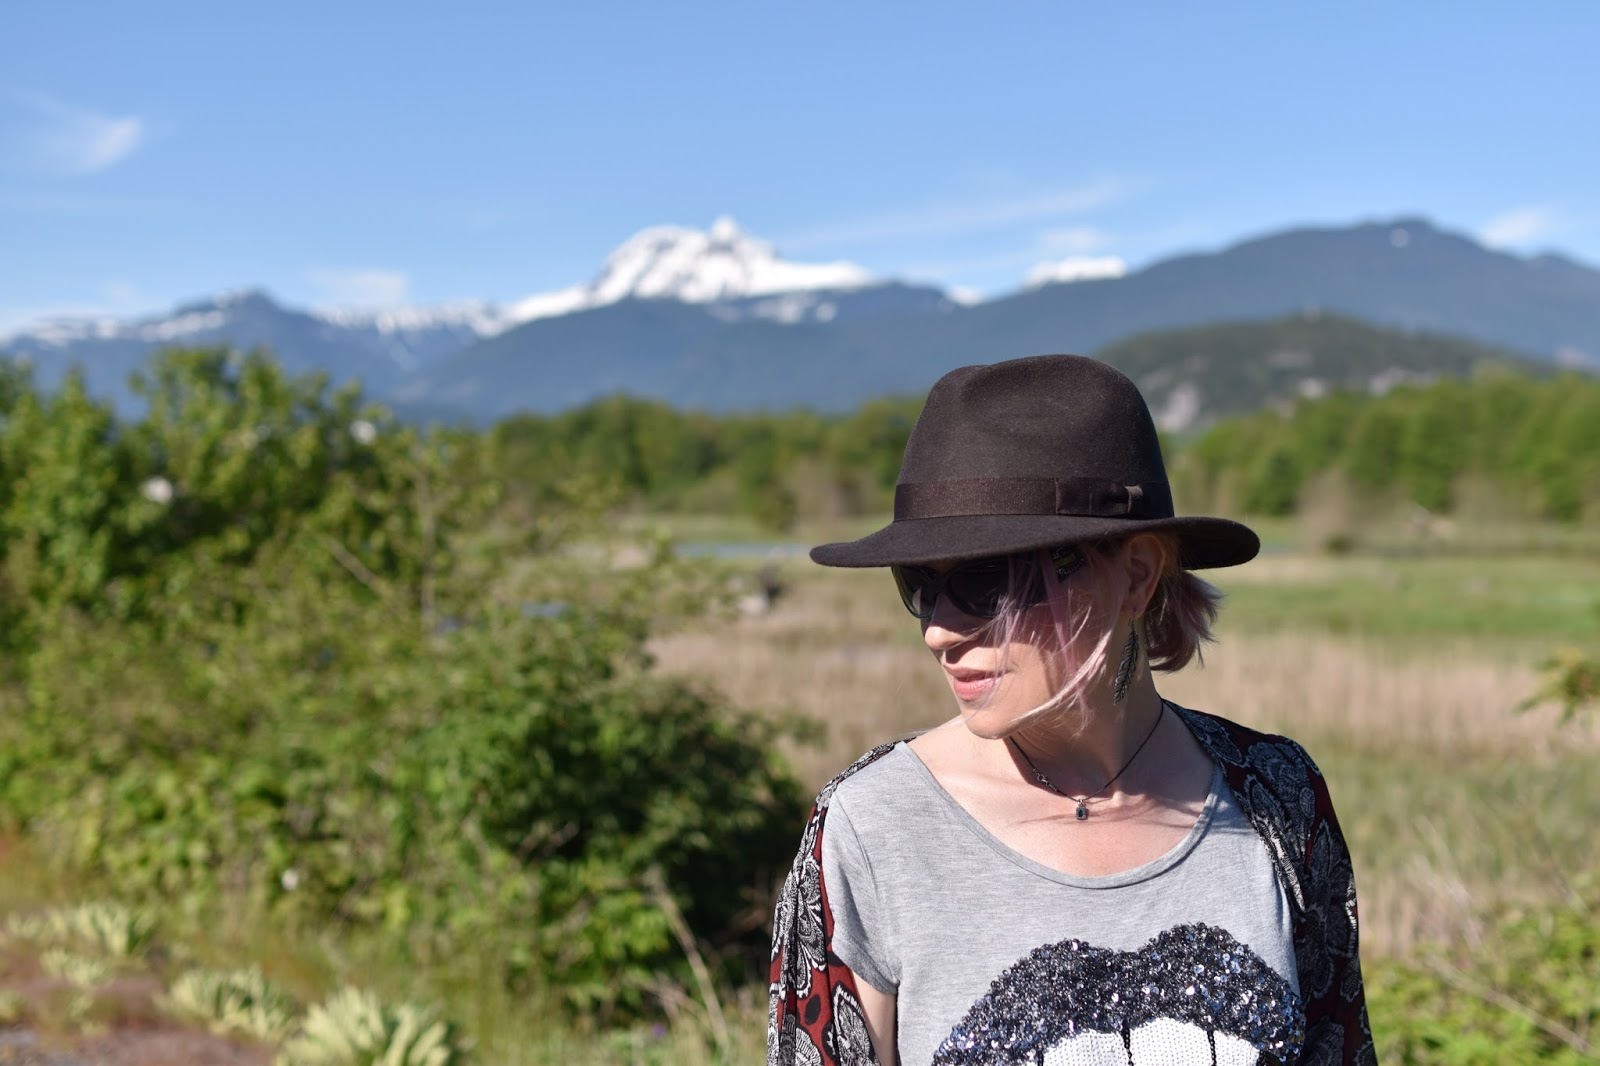 Monika Faulkner outfit inspiration - sequinned tee, floral kimono, felt fedora, sunglasses